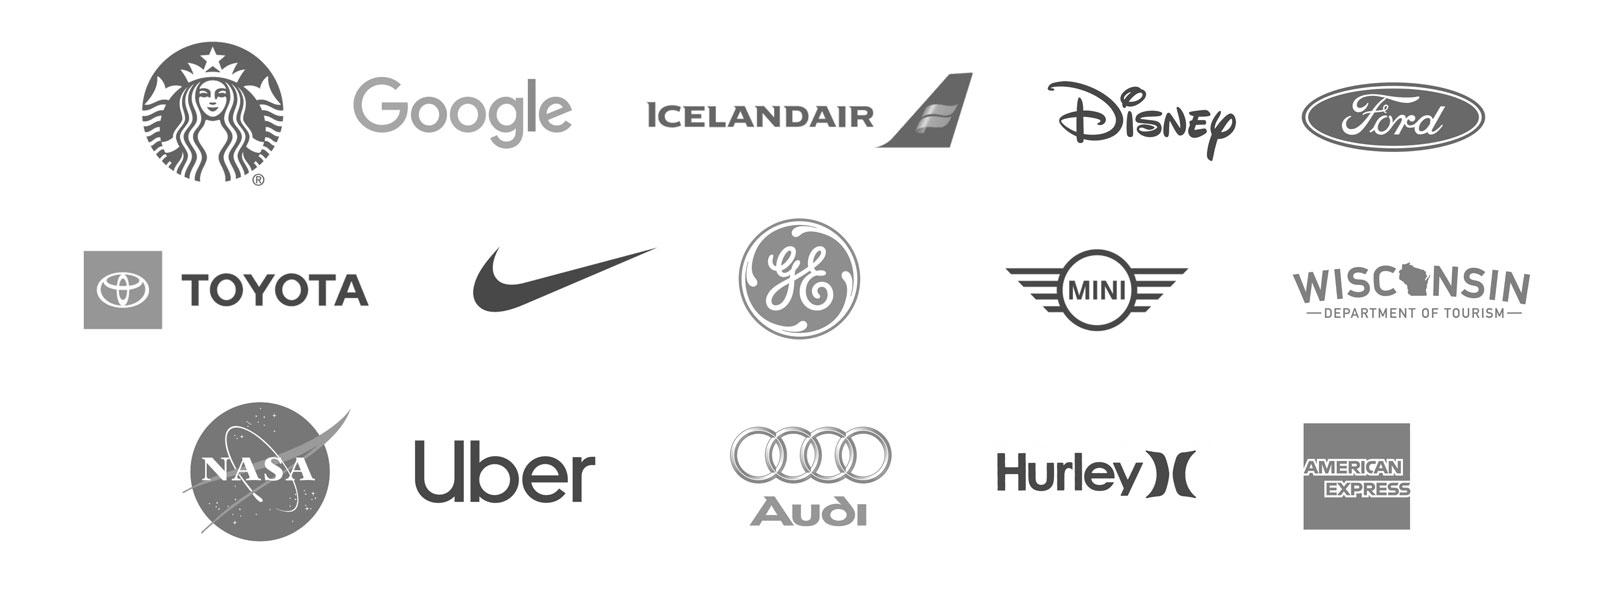 Nike, Google, MINI, Uber, Travel Wisconsin, Audi, Hurley and General Electric